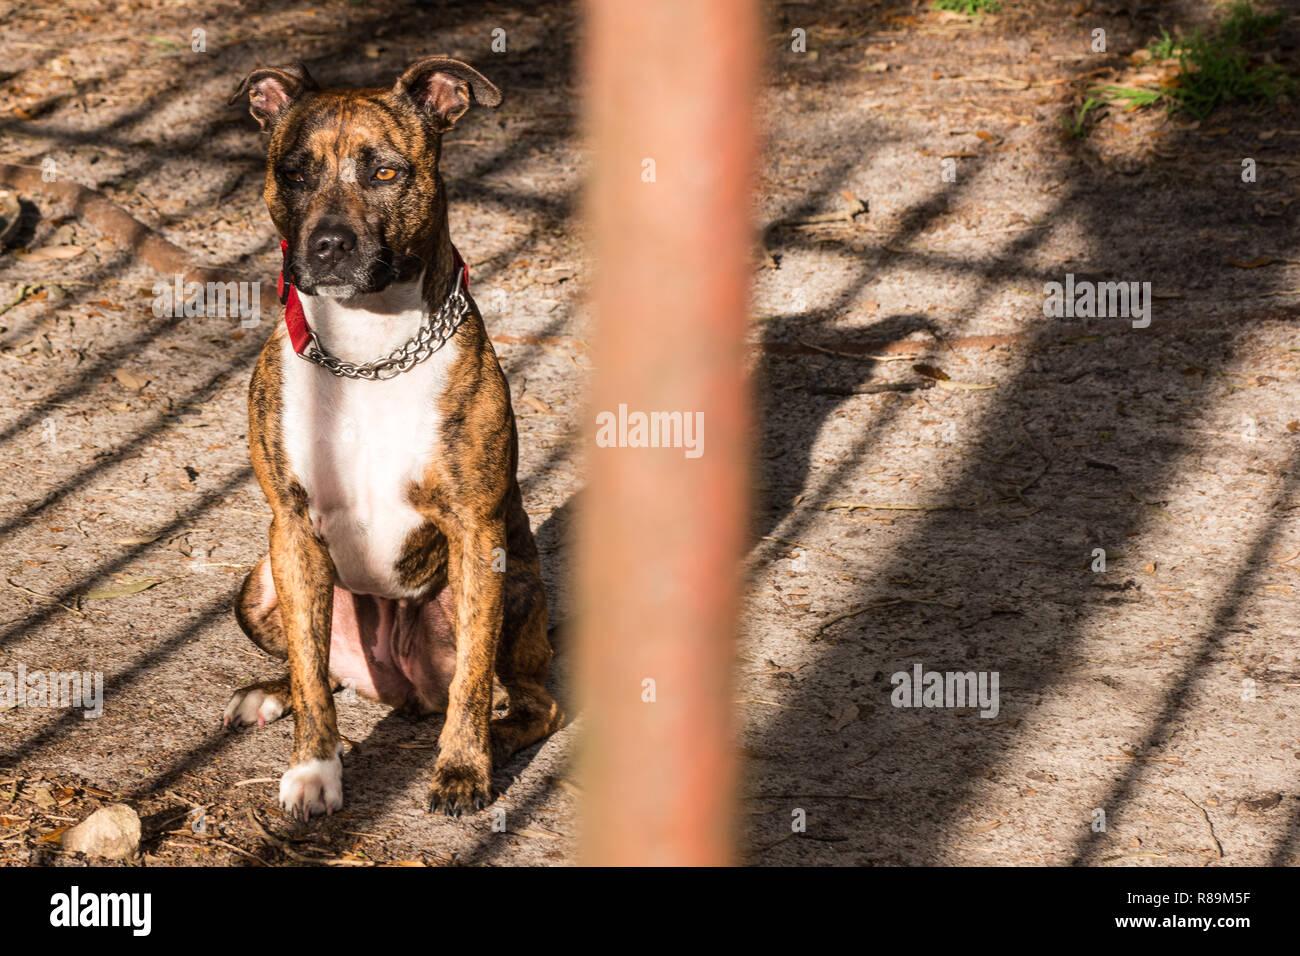 Staffordshire terrier cross - Stock Image